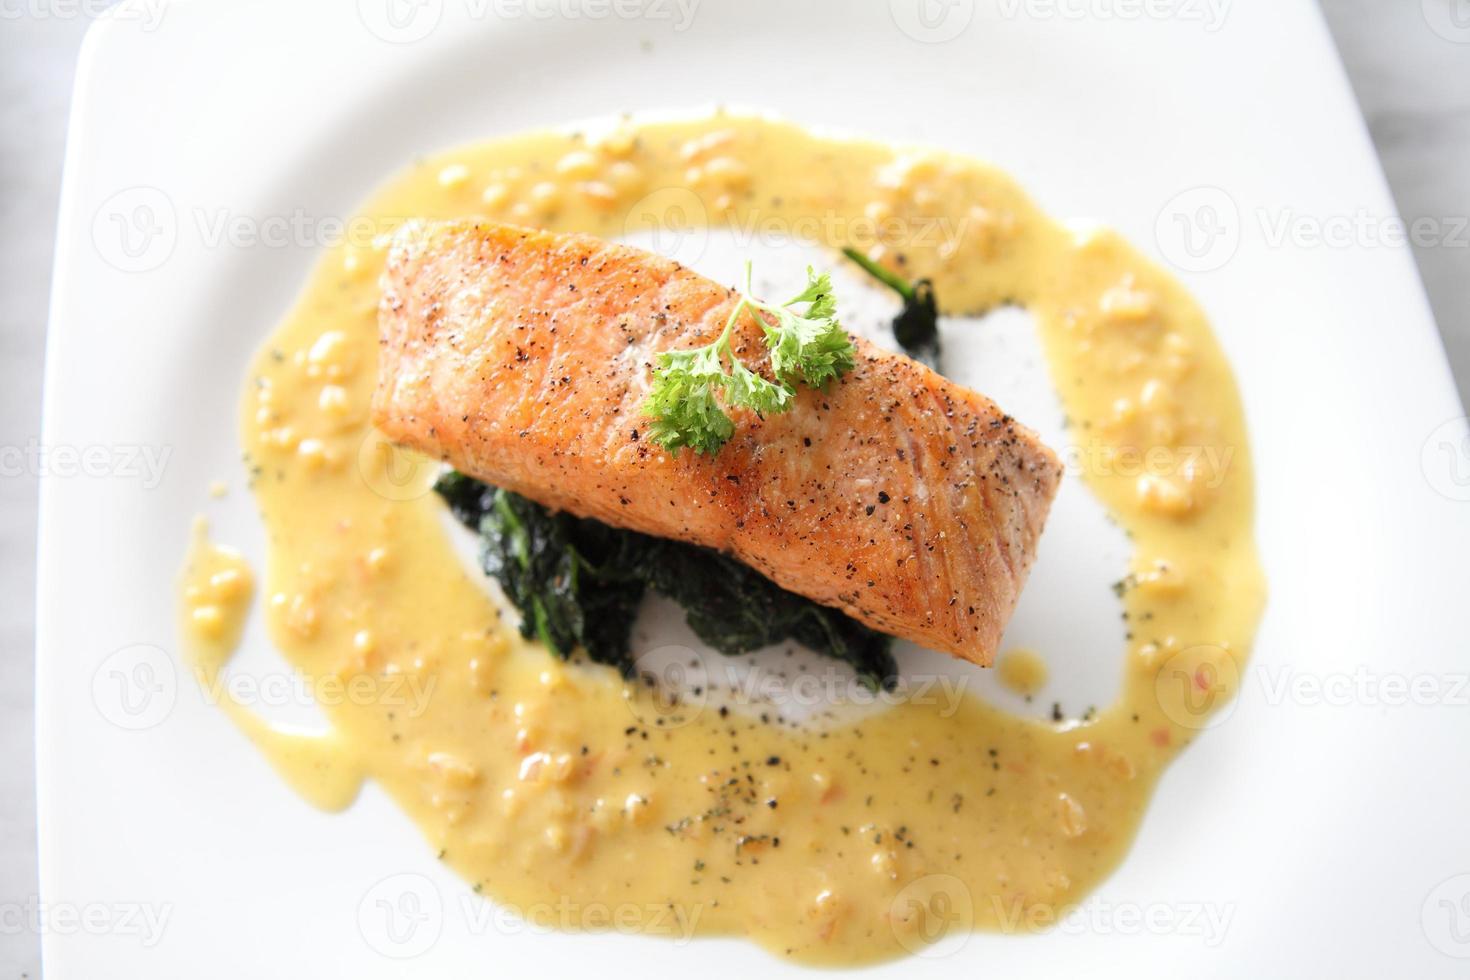 salmón al horno foto